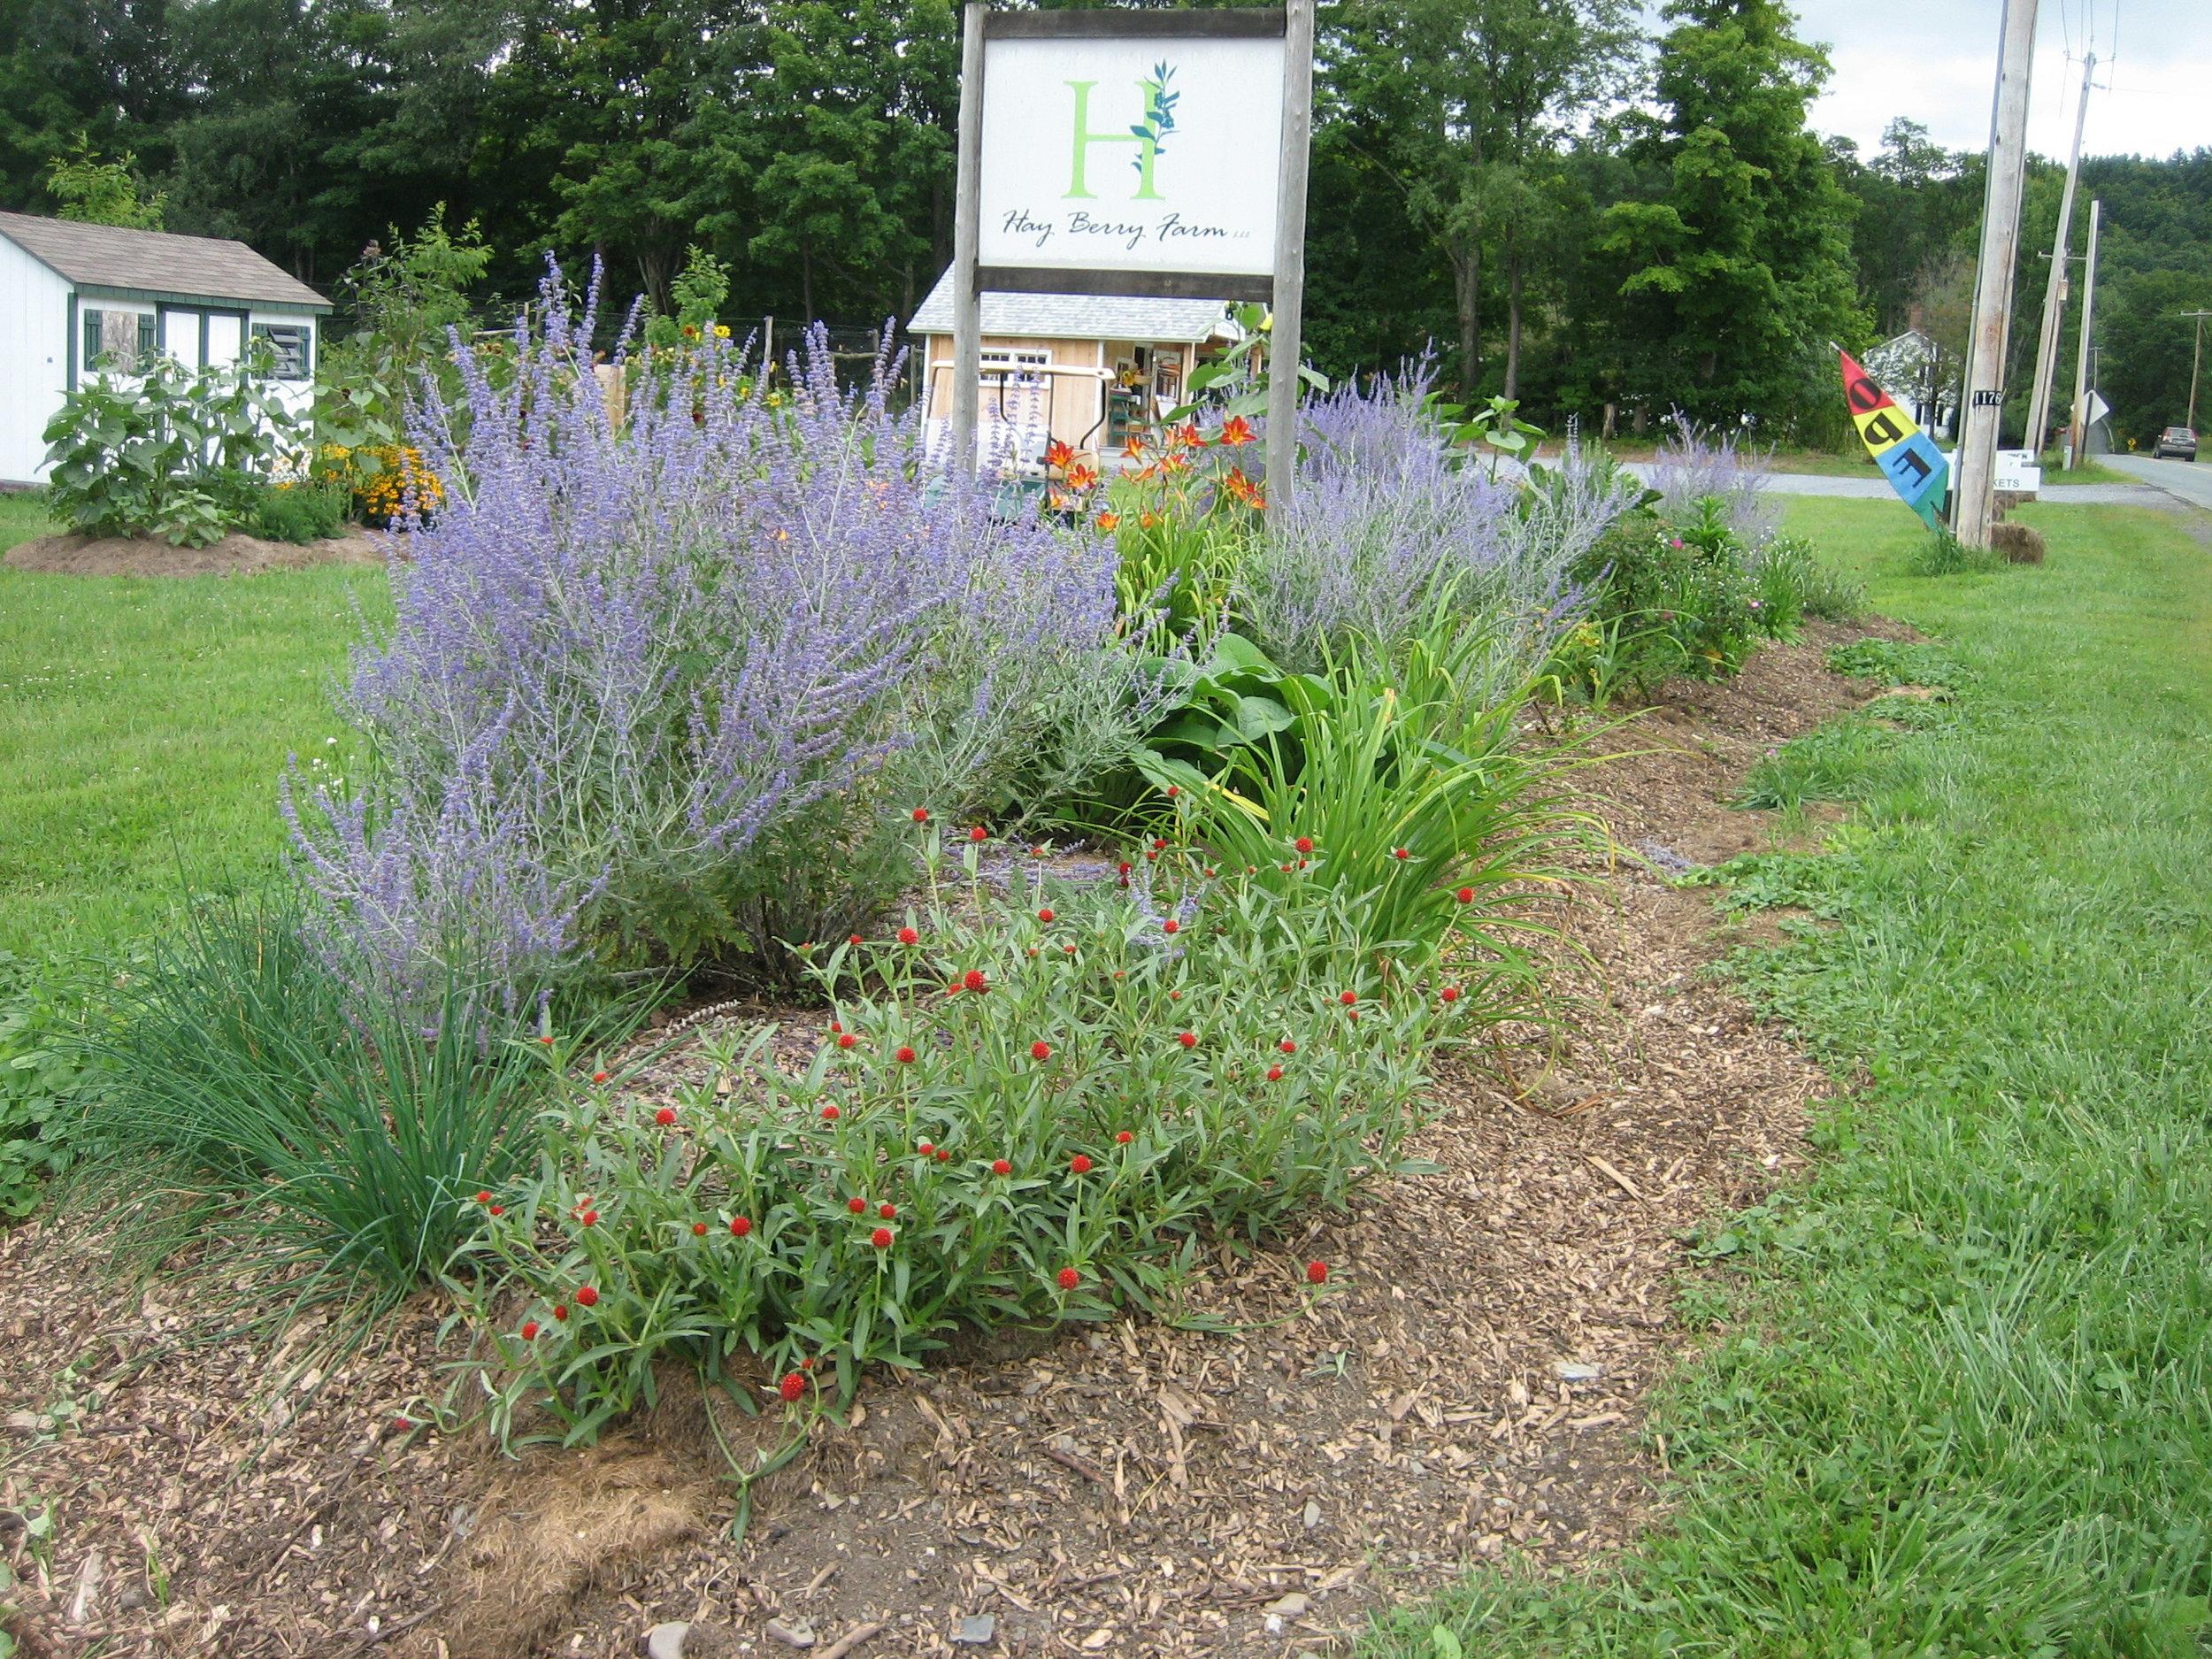 Hayberry Farm -